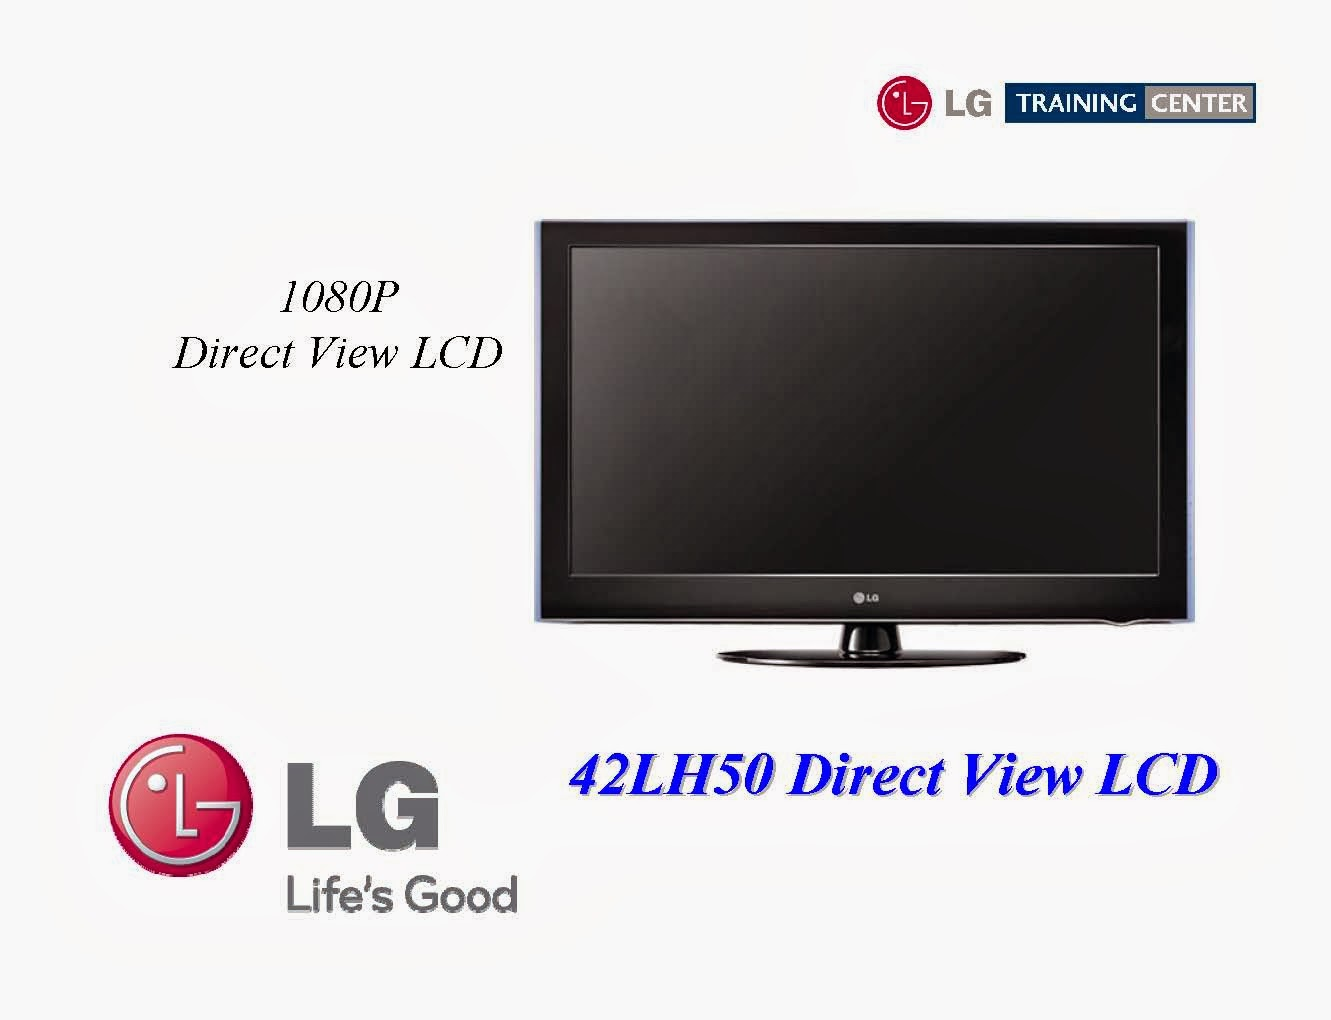 LG 42LH50 LCD (EEFL-Ballast) TV Training Manual